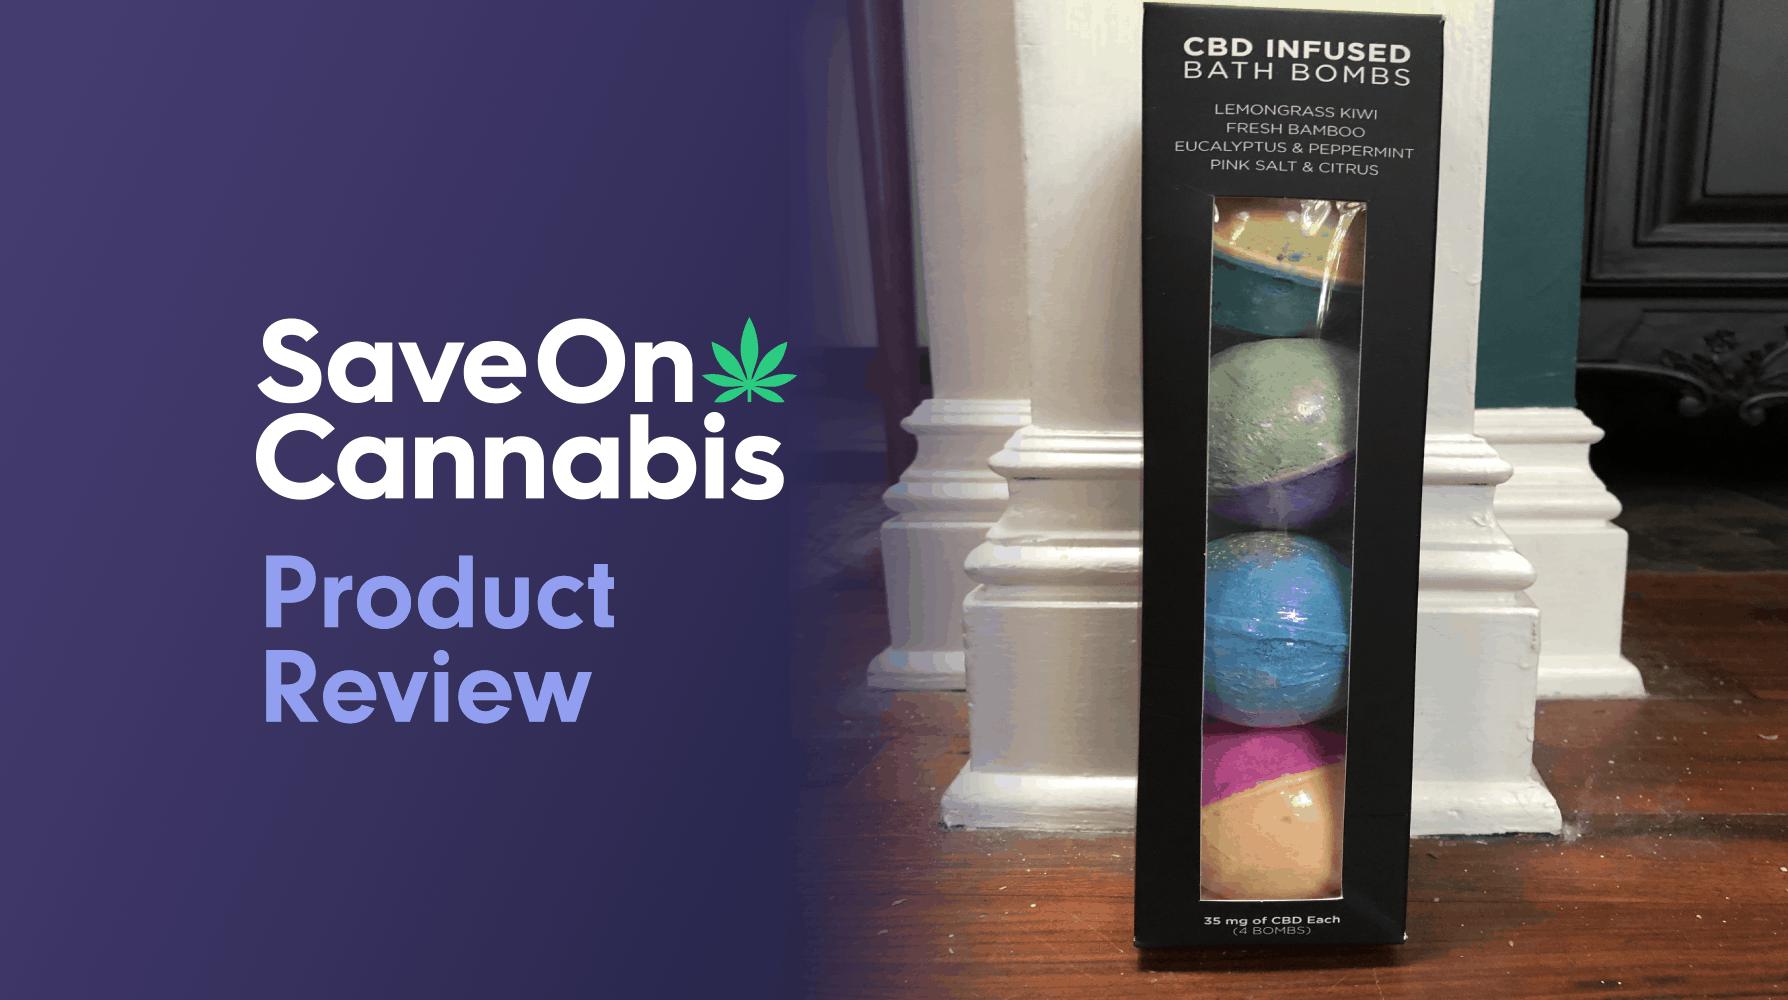 CBD FOR LIFE EUCALYPTUS & PEPPERMINT BATH BOMB Save On Cannabis Review Website